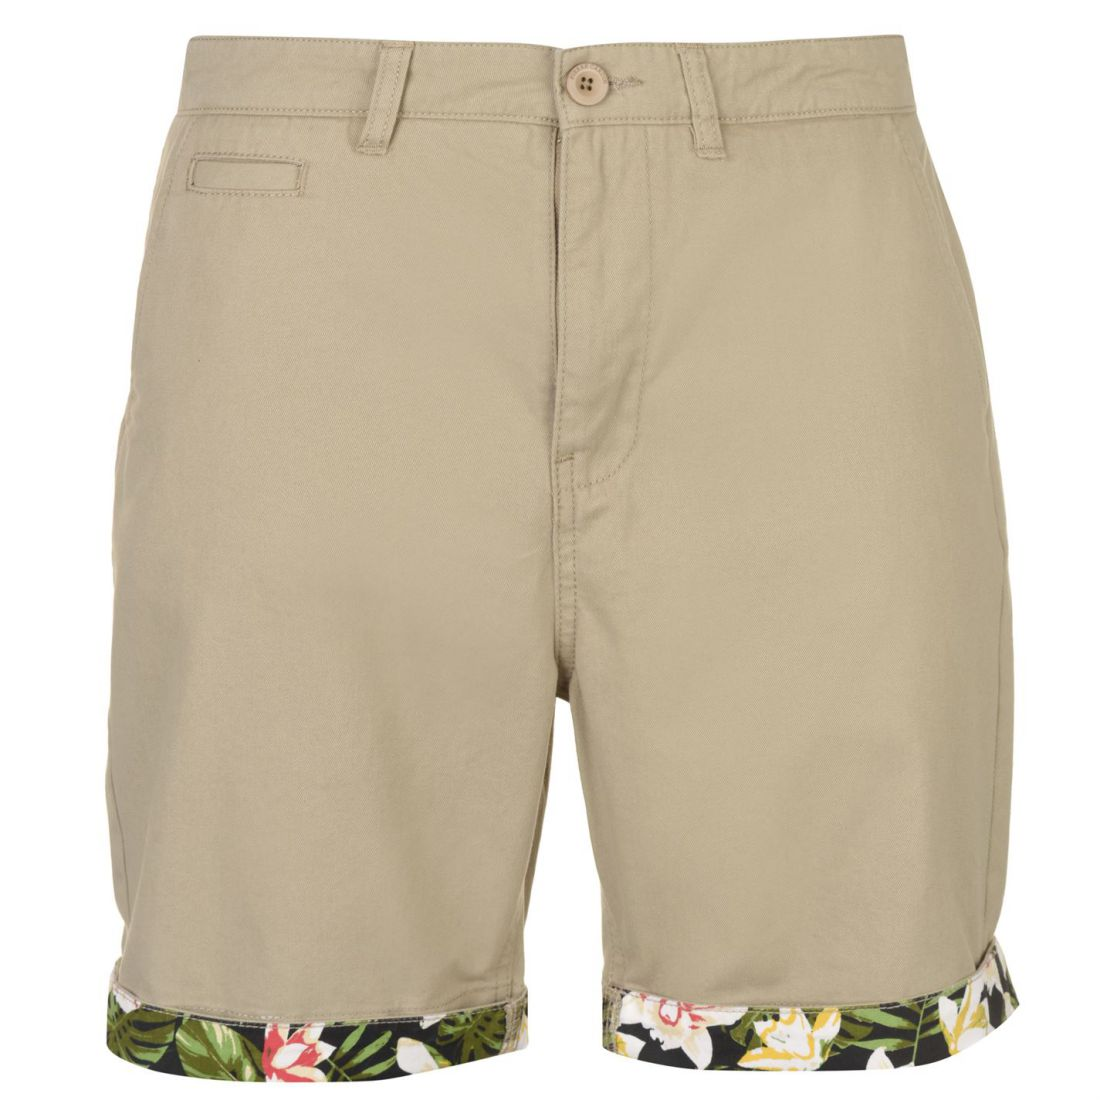 Pierre Cardin Homme AOP Turn Up Shorts Pantalon Chino Pantalon Pantalon Chino